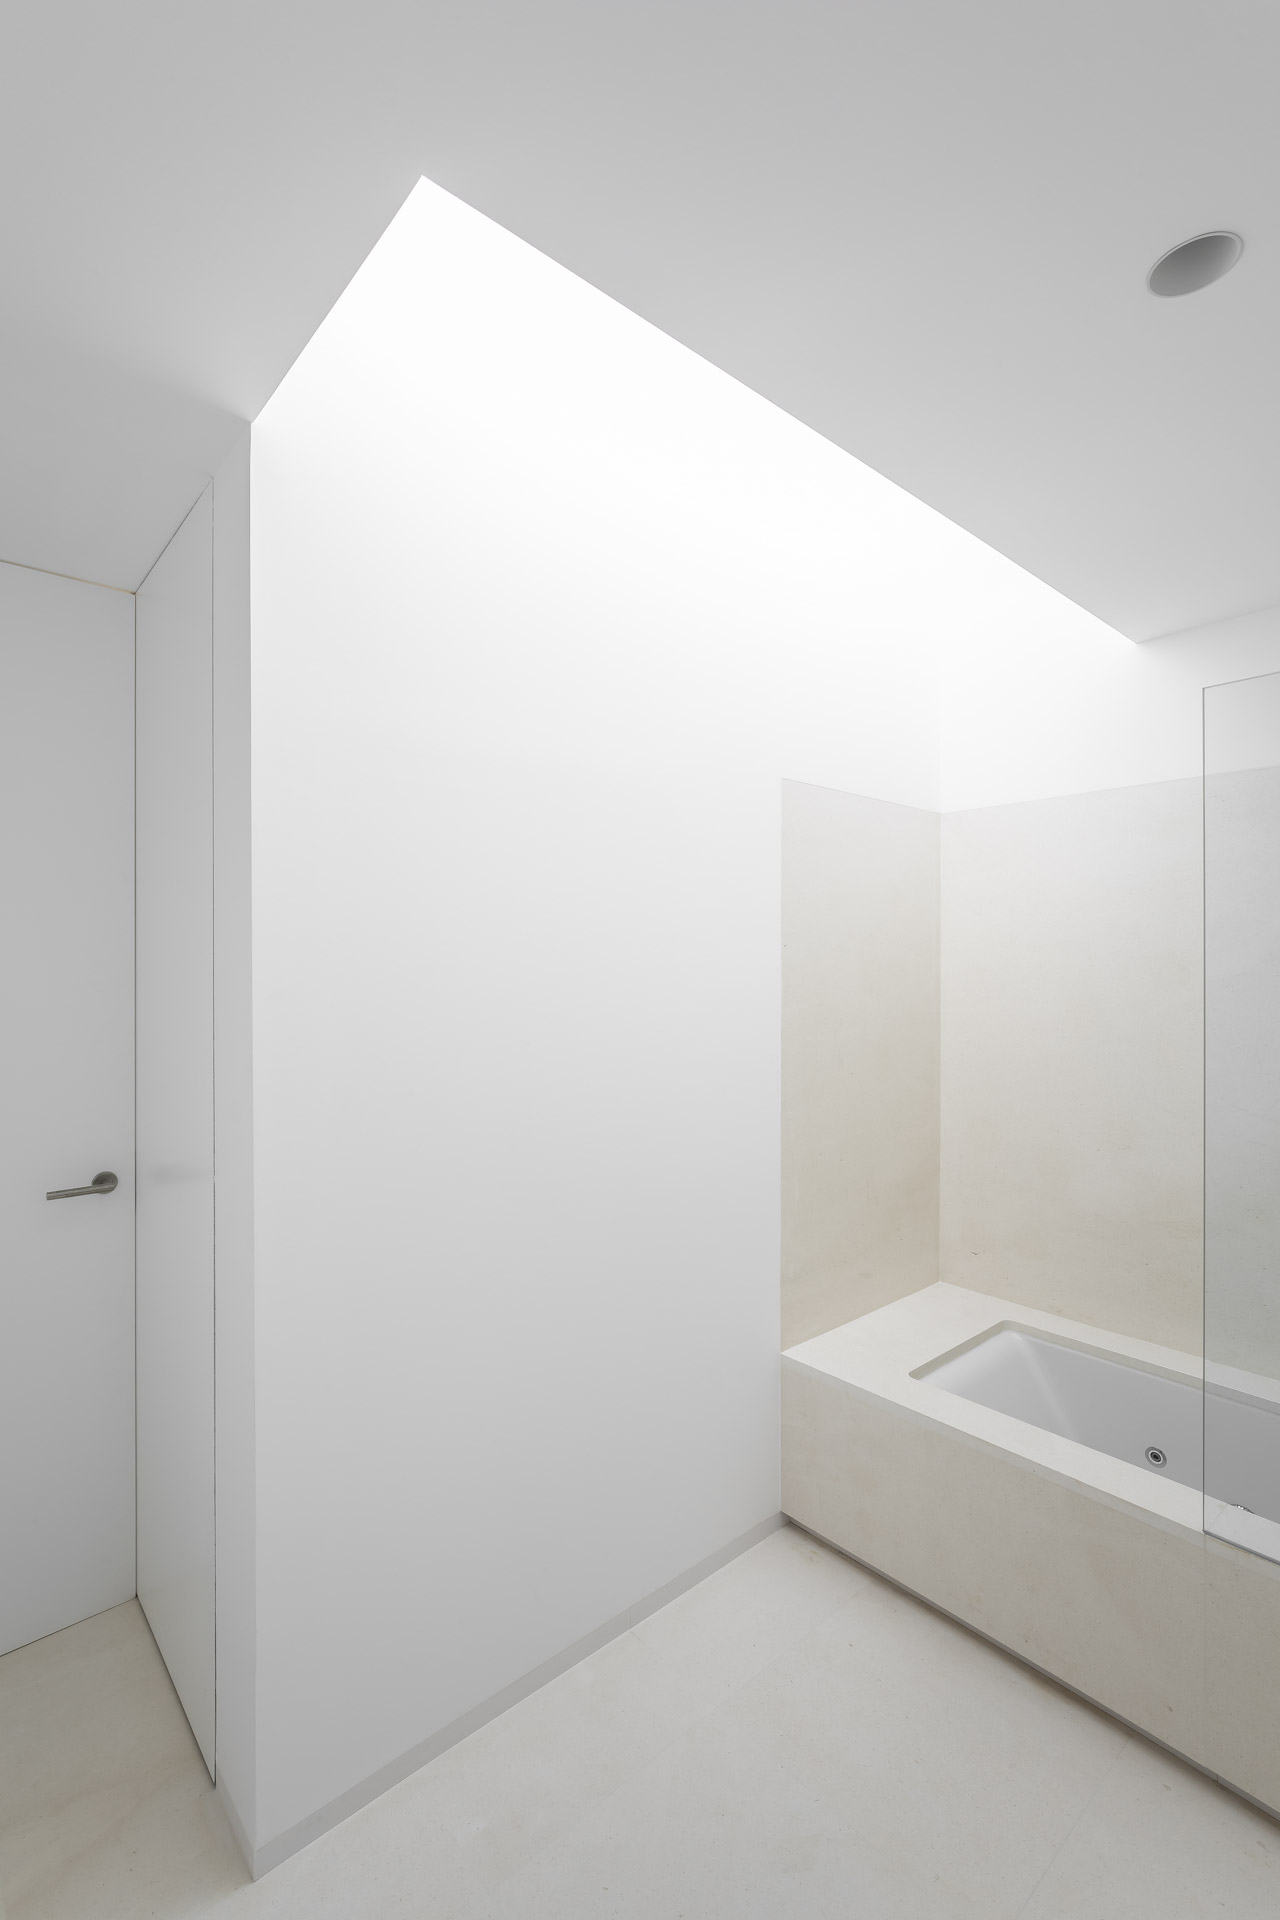 fotografia-arquitectura-valencia-german-cabo-gallardo-llopis-villamarchante-vivienda-29